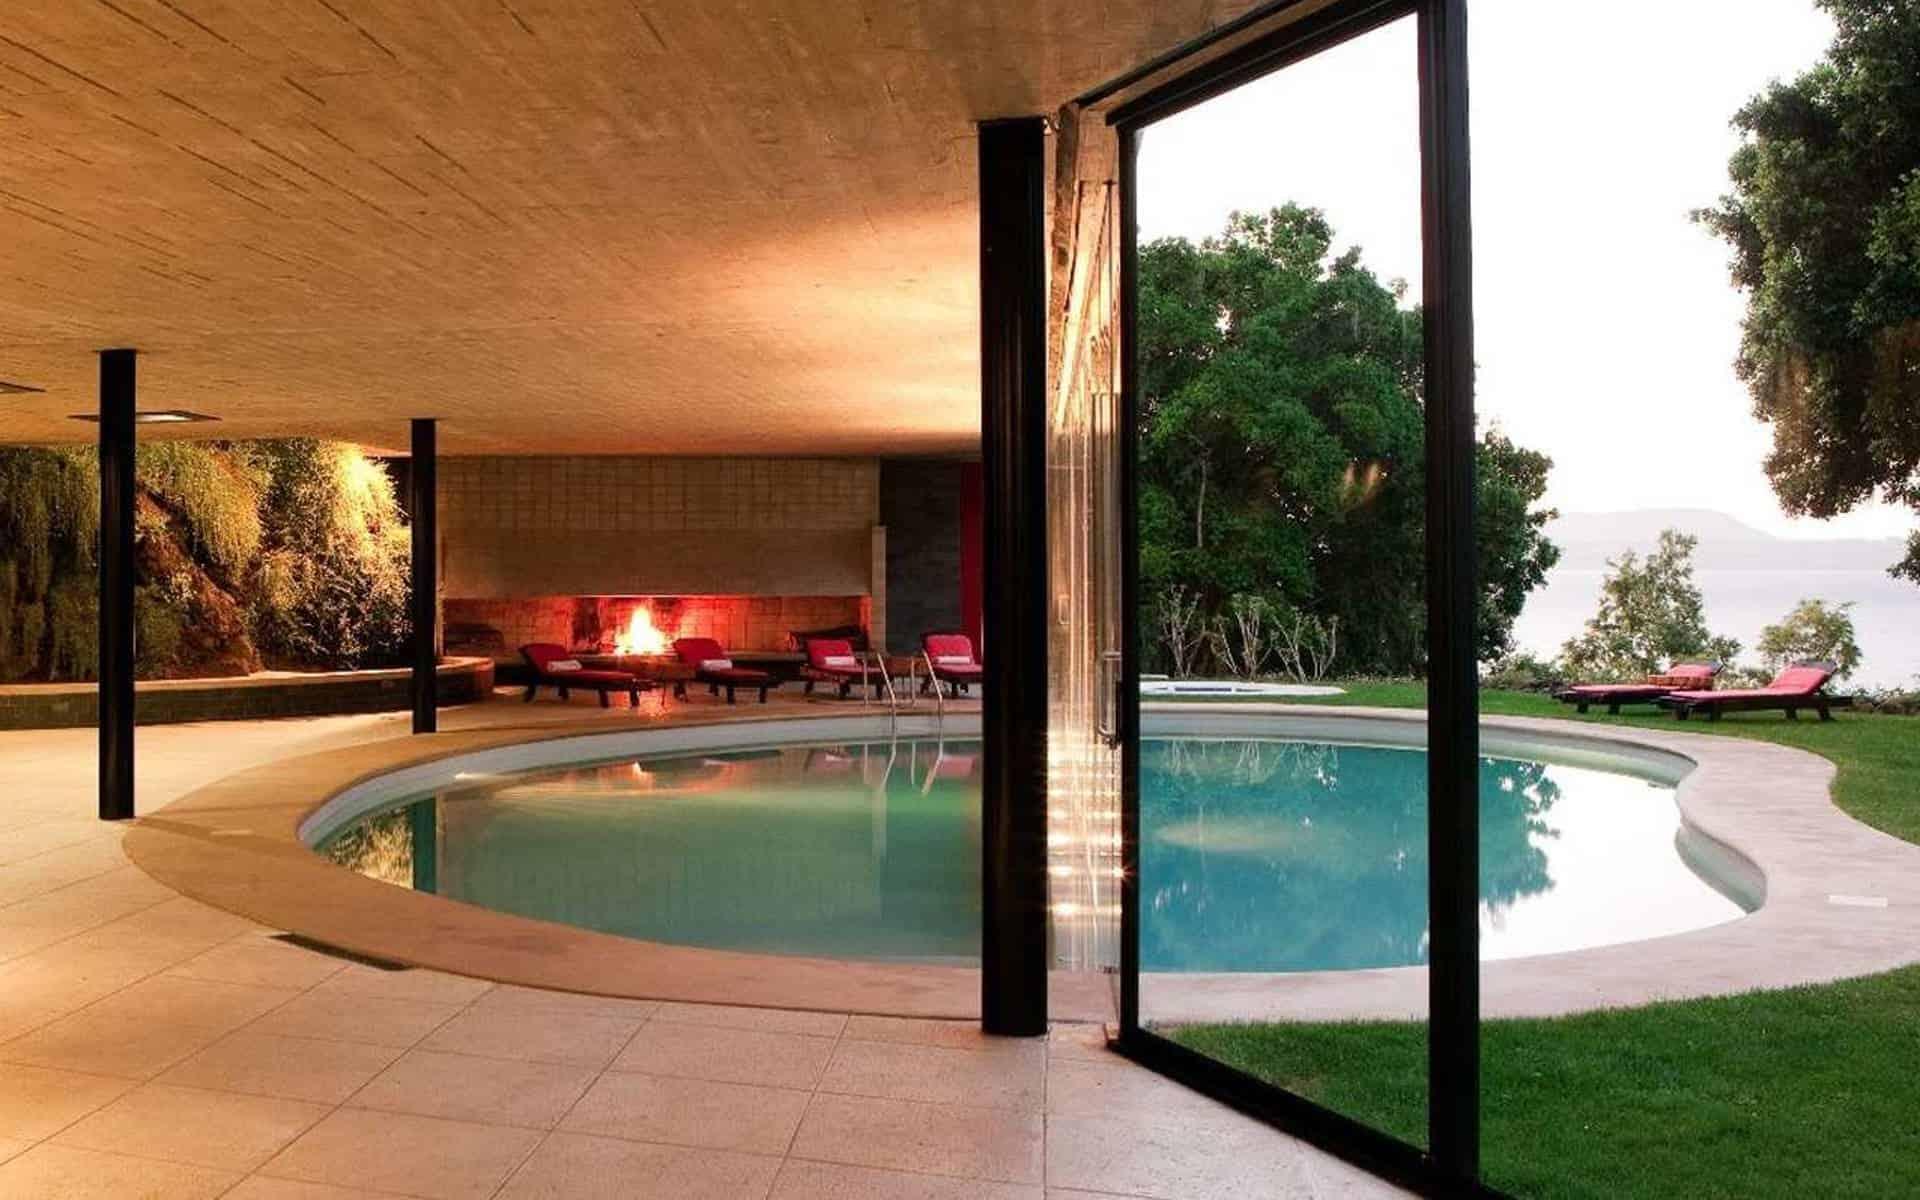 honeymoon top 10 alternative destinations Pucon Chile Antumalal Hotel